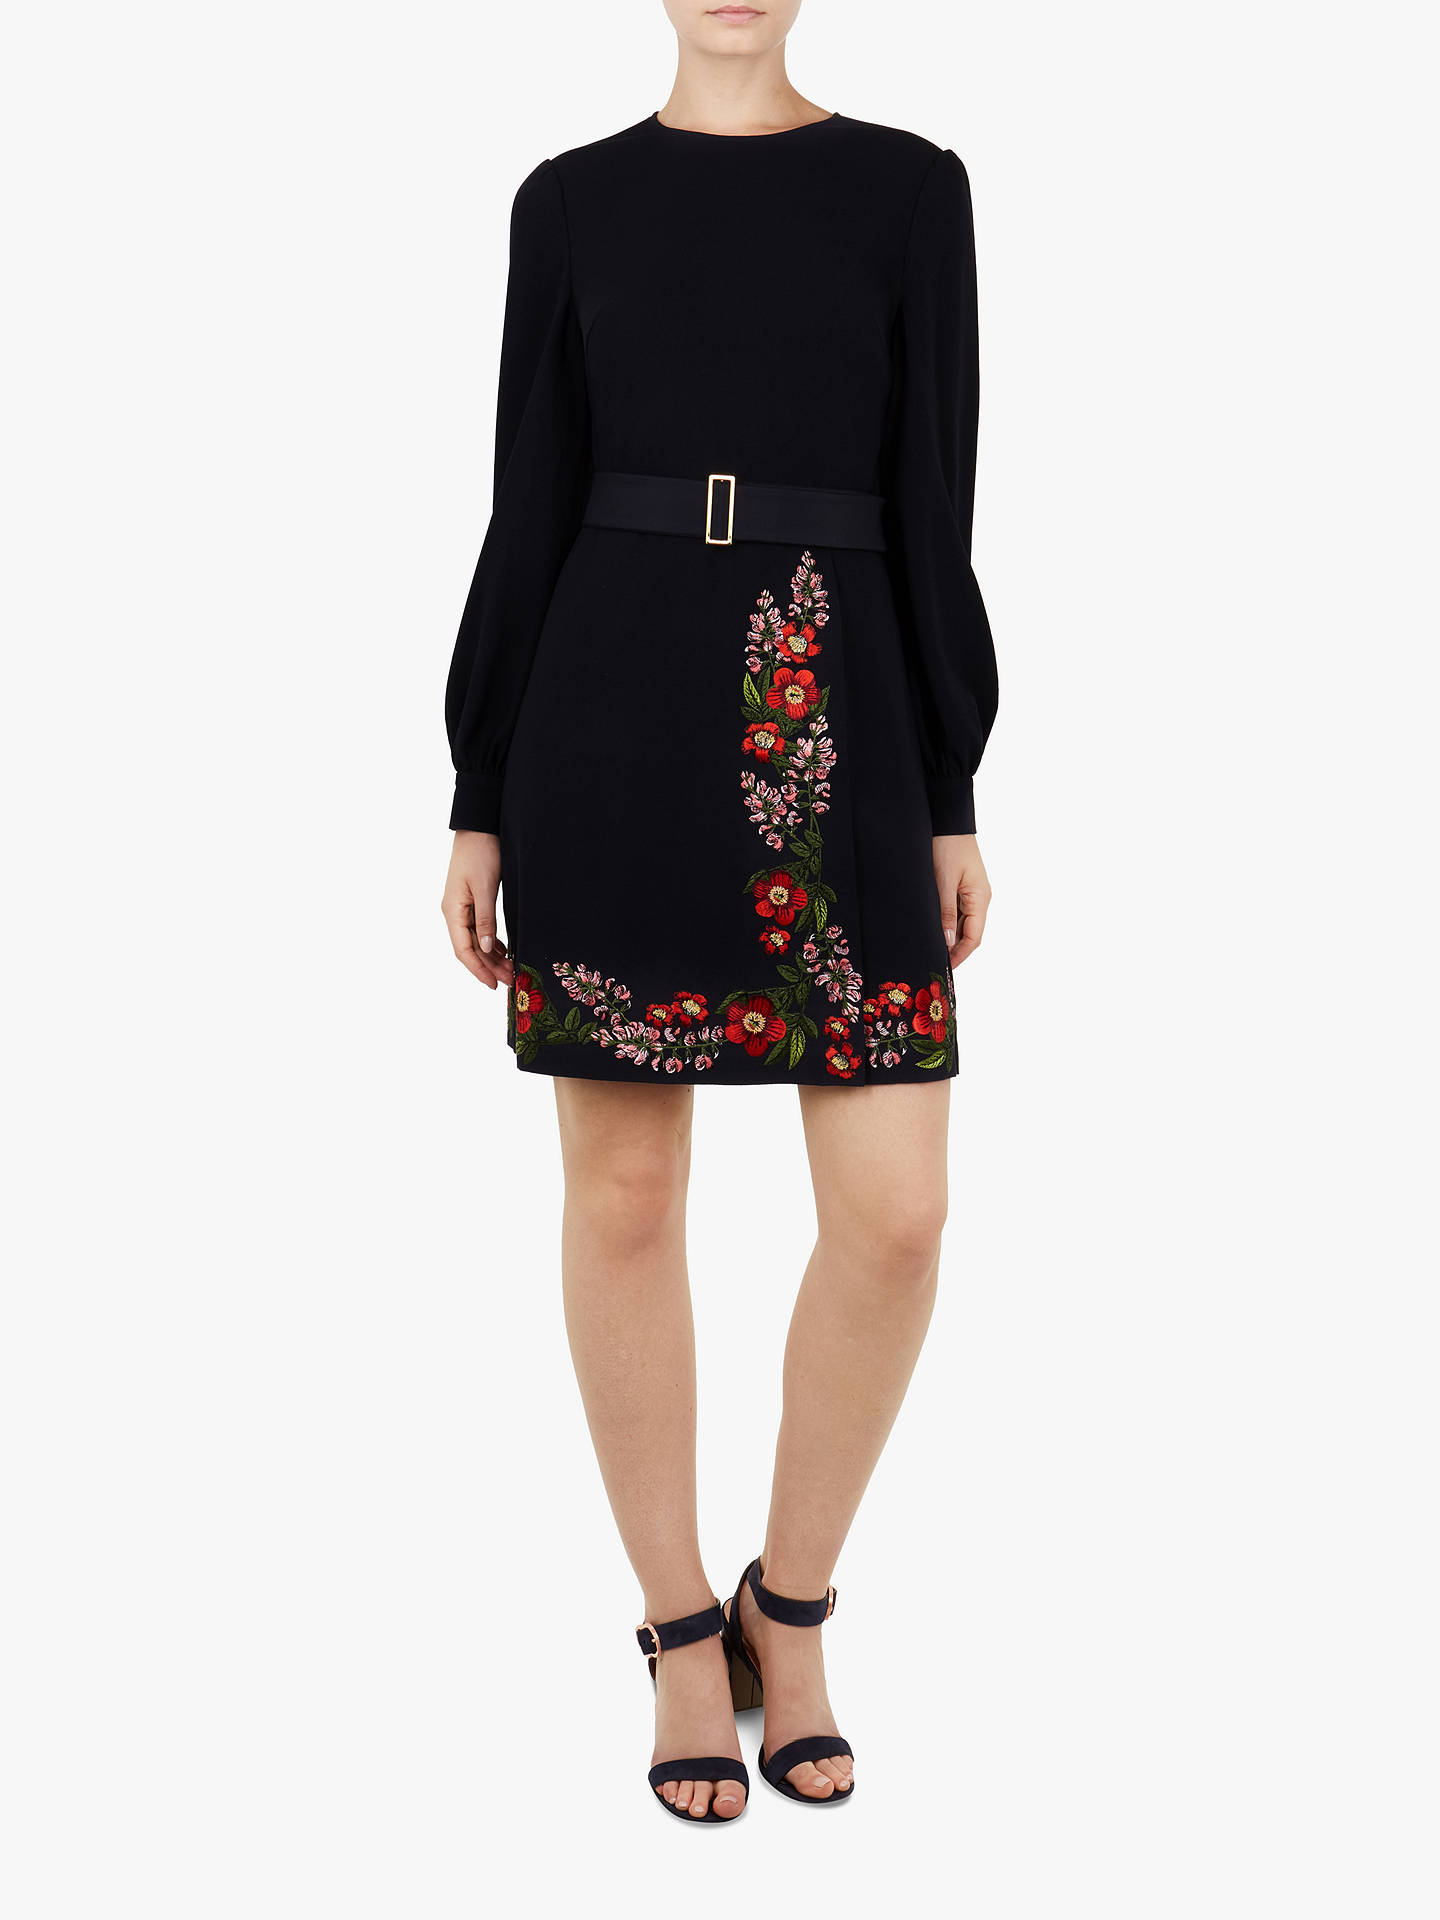 2fcb3bb2874504 Buy Ted Baker Siliia Kirtstenbosch Embroidered Wrap Dress